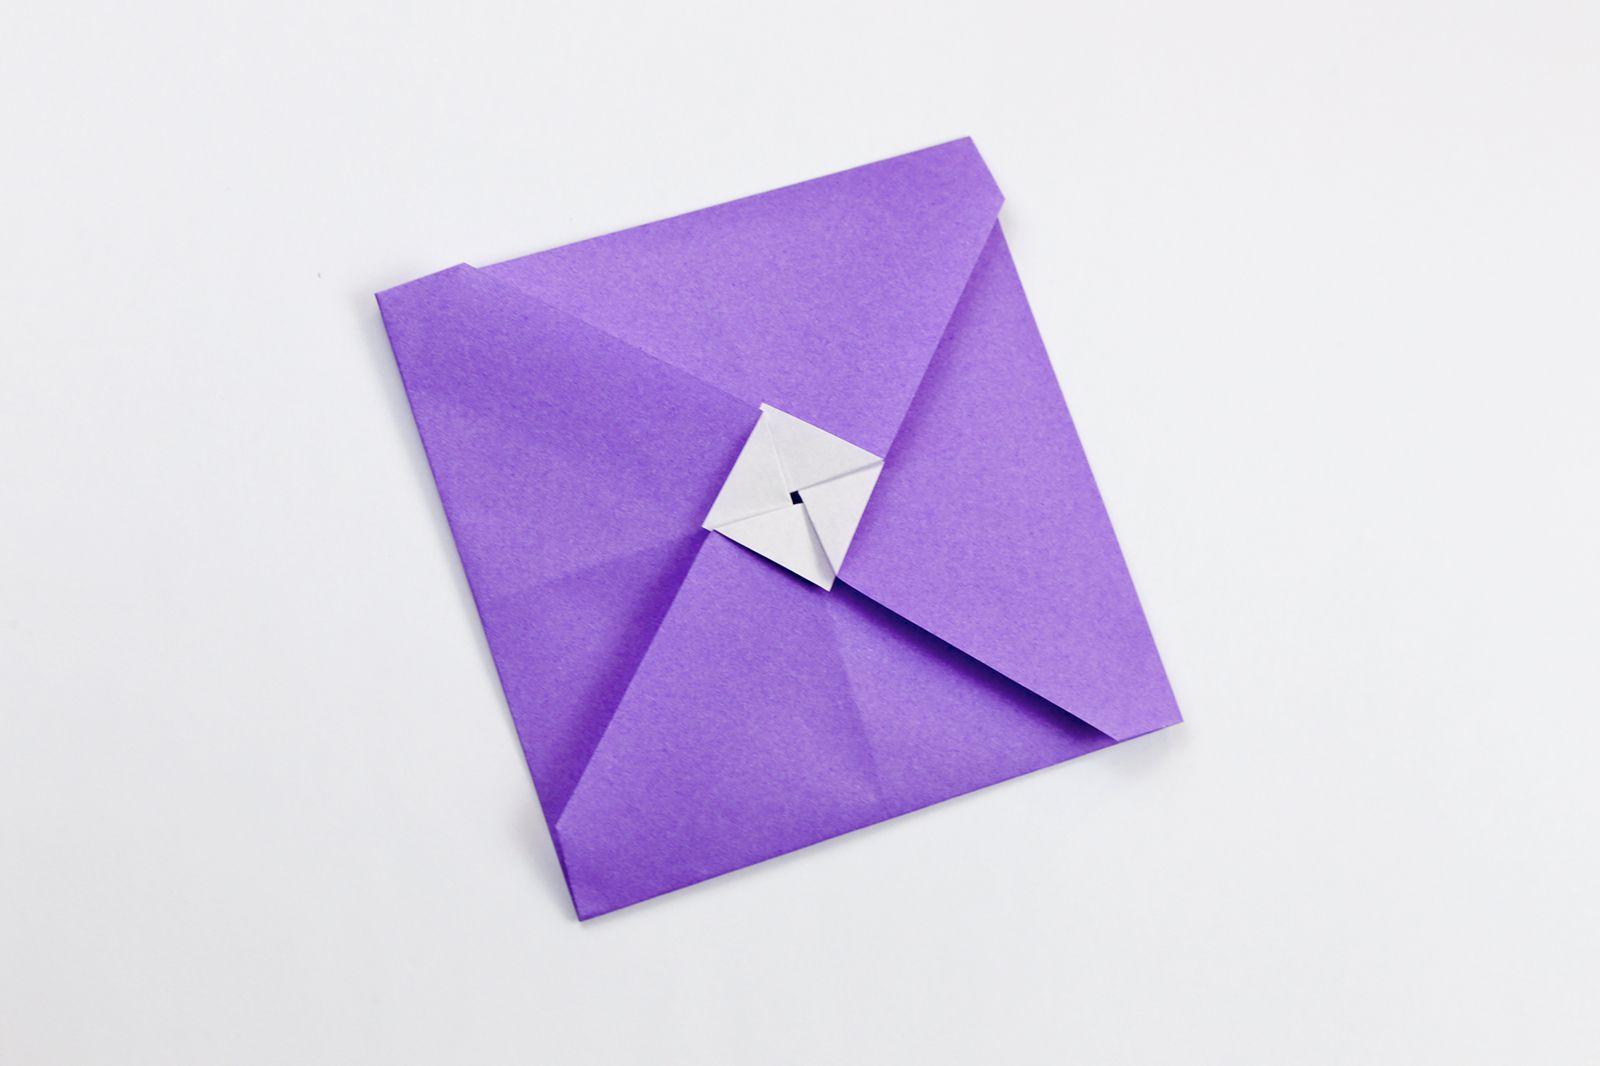 Origami bamboo letterfold folding instructions - Origami Tato Envelope Variation Instructions